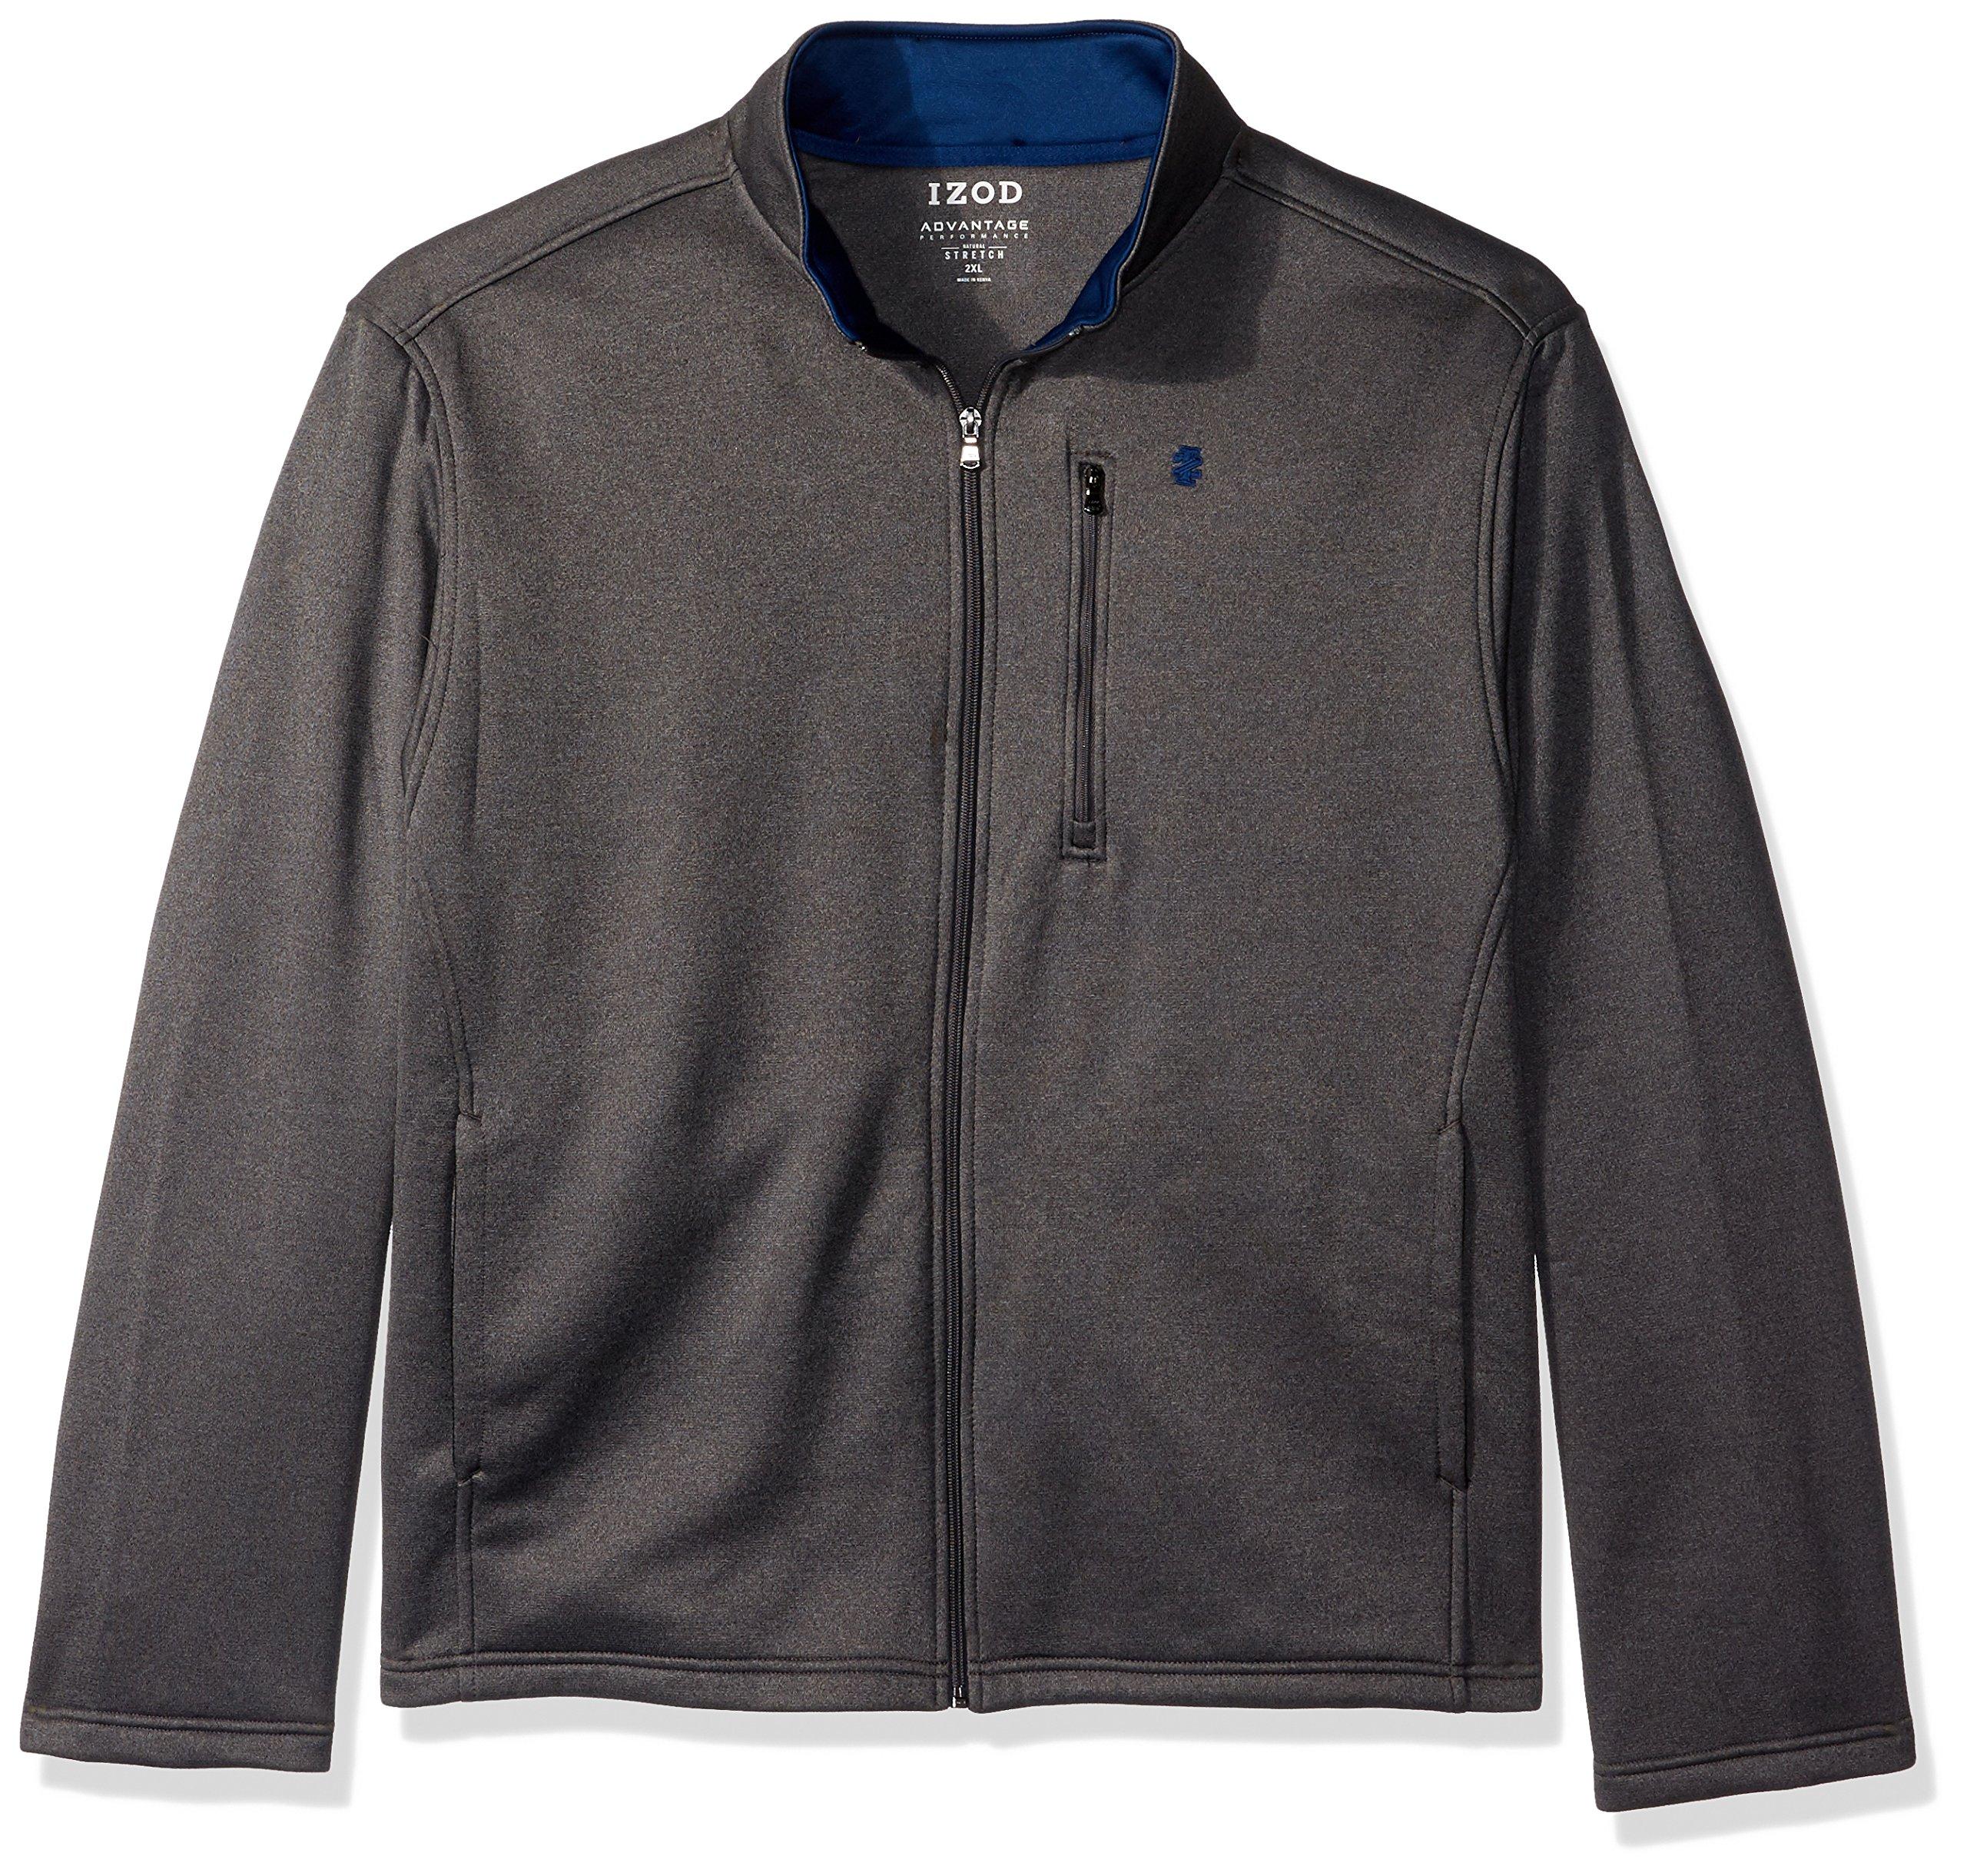 IZOD Men's Big and Tall Spectator Solid Fleece Jacket, Asphalt Heather, 4X-Large Big